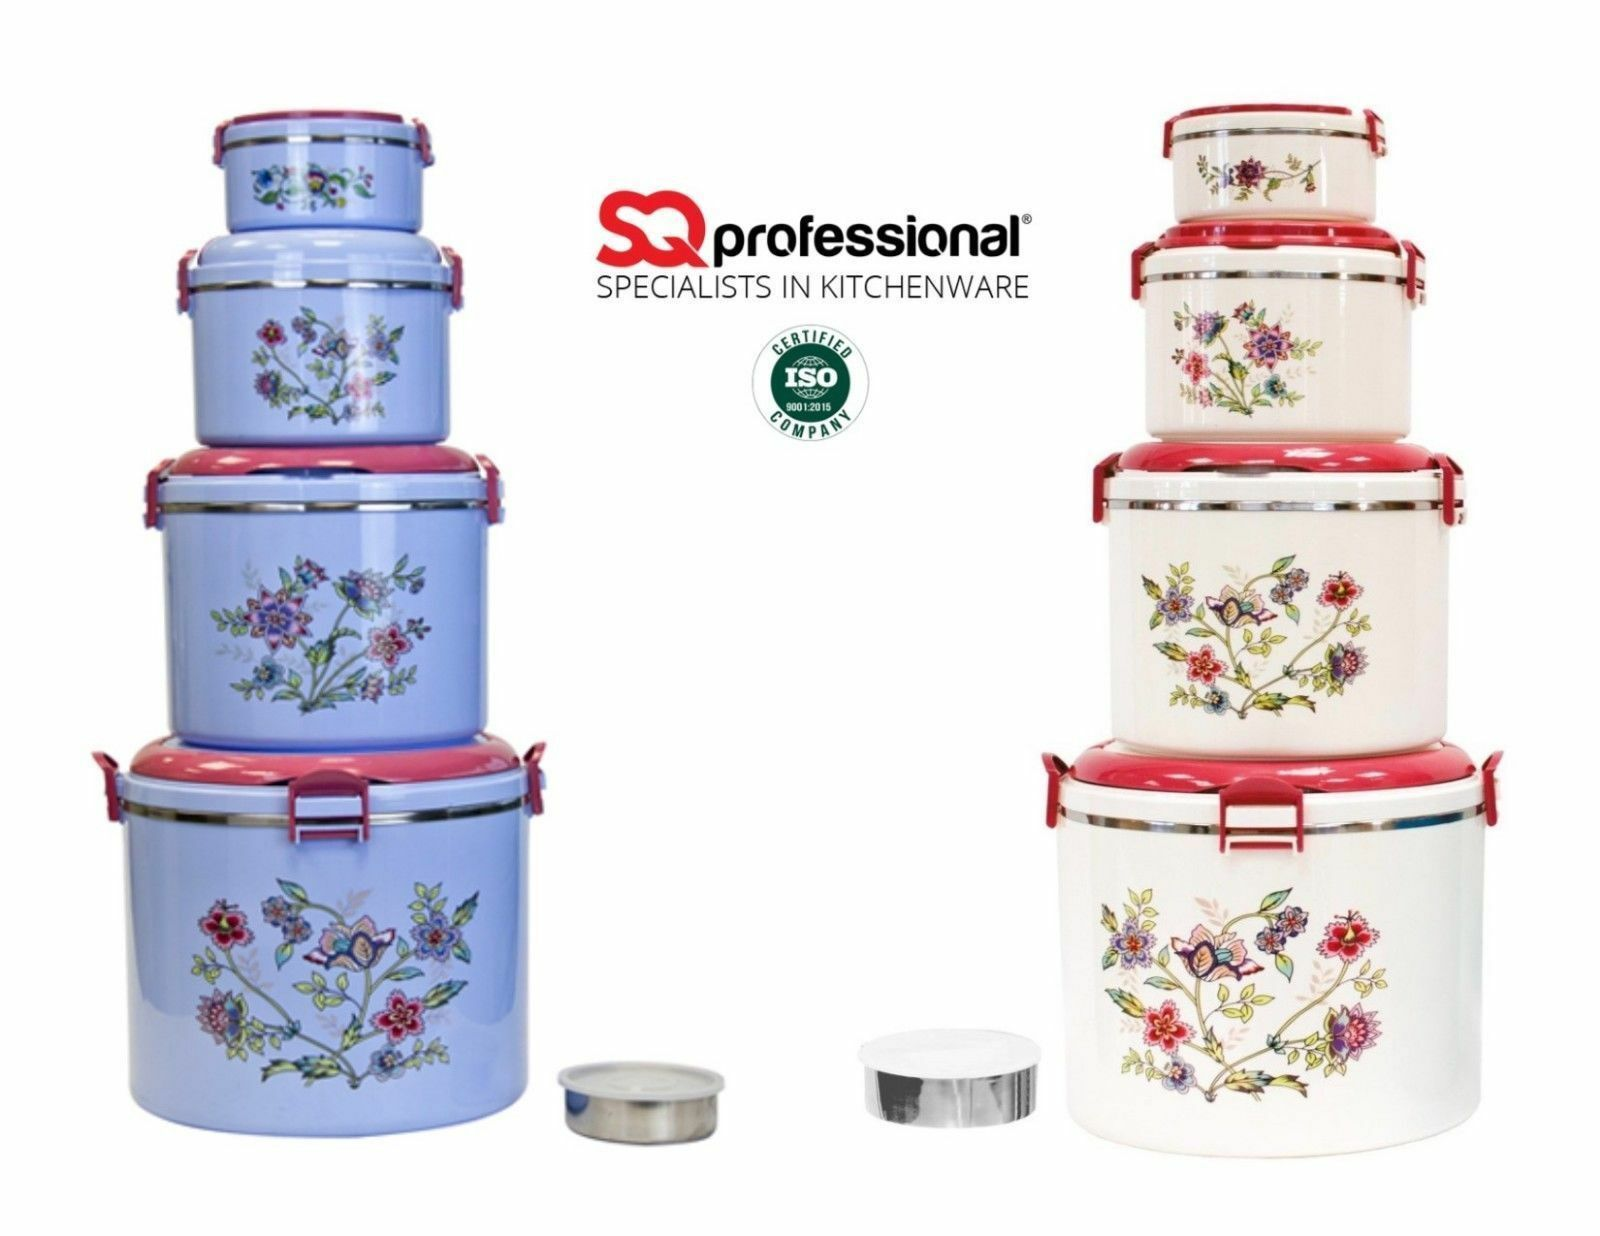 5pc Elite Jumbo ROUND HOT Isolato Casseruola Scaldavivande Hot Pot Set Pan PIC-NIC